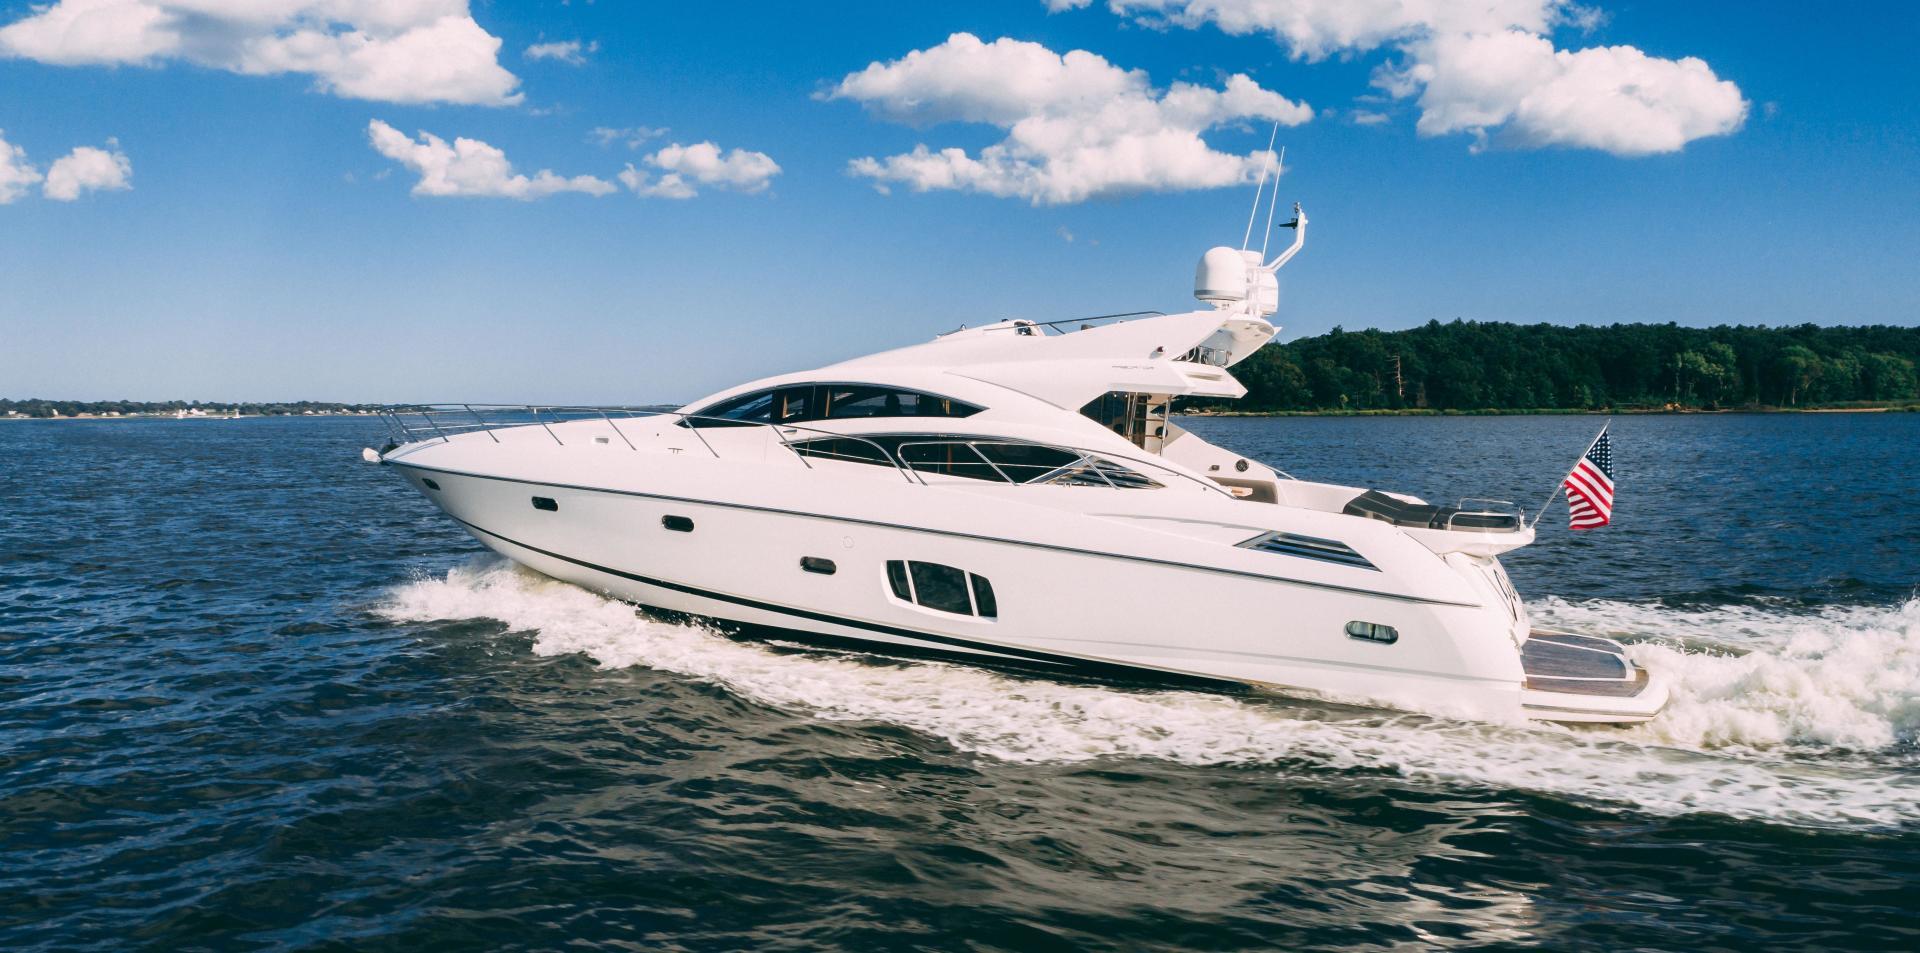 Sunseeker-Motor yacht 2012-JIMBO New Port-Rhode Island-United States-1480123 | Thumbnail